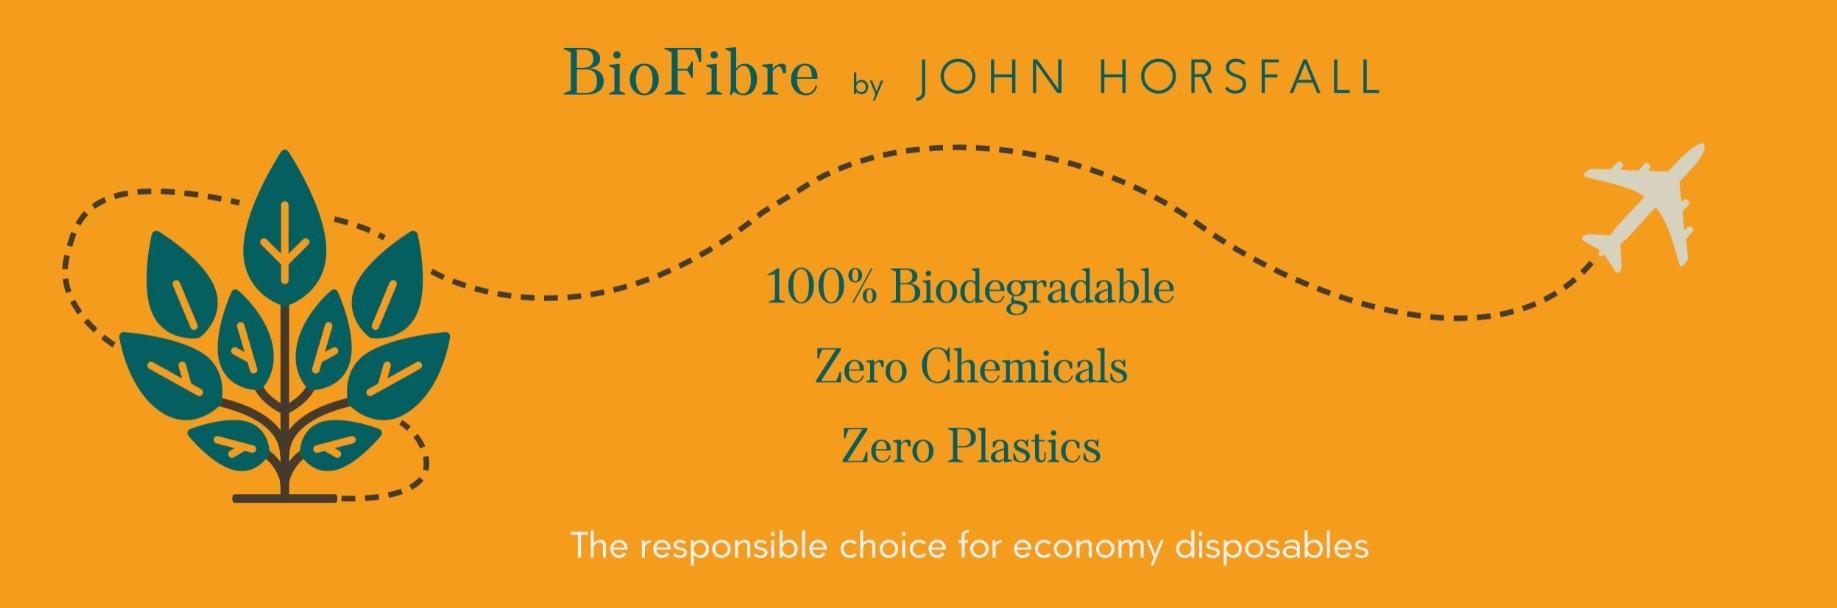 BioFibre By John Horsfall